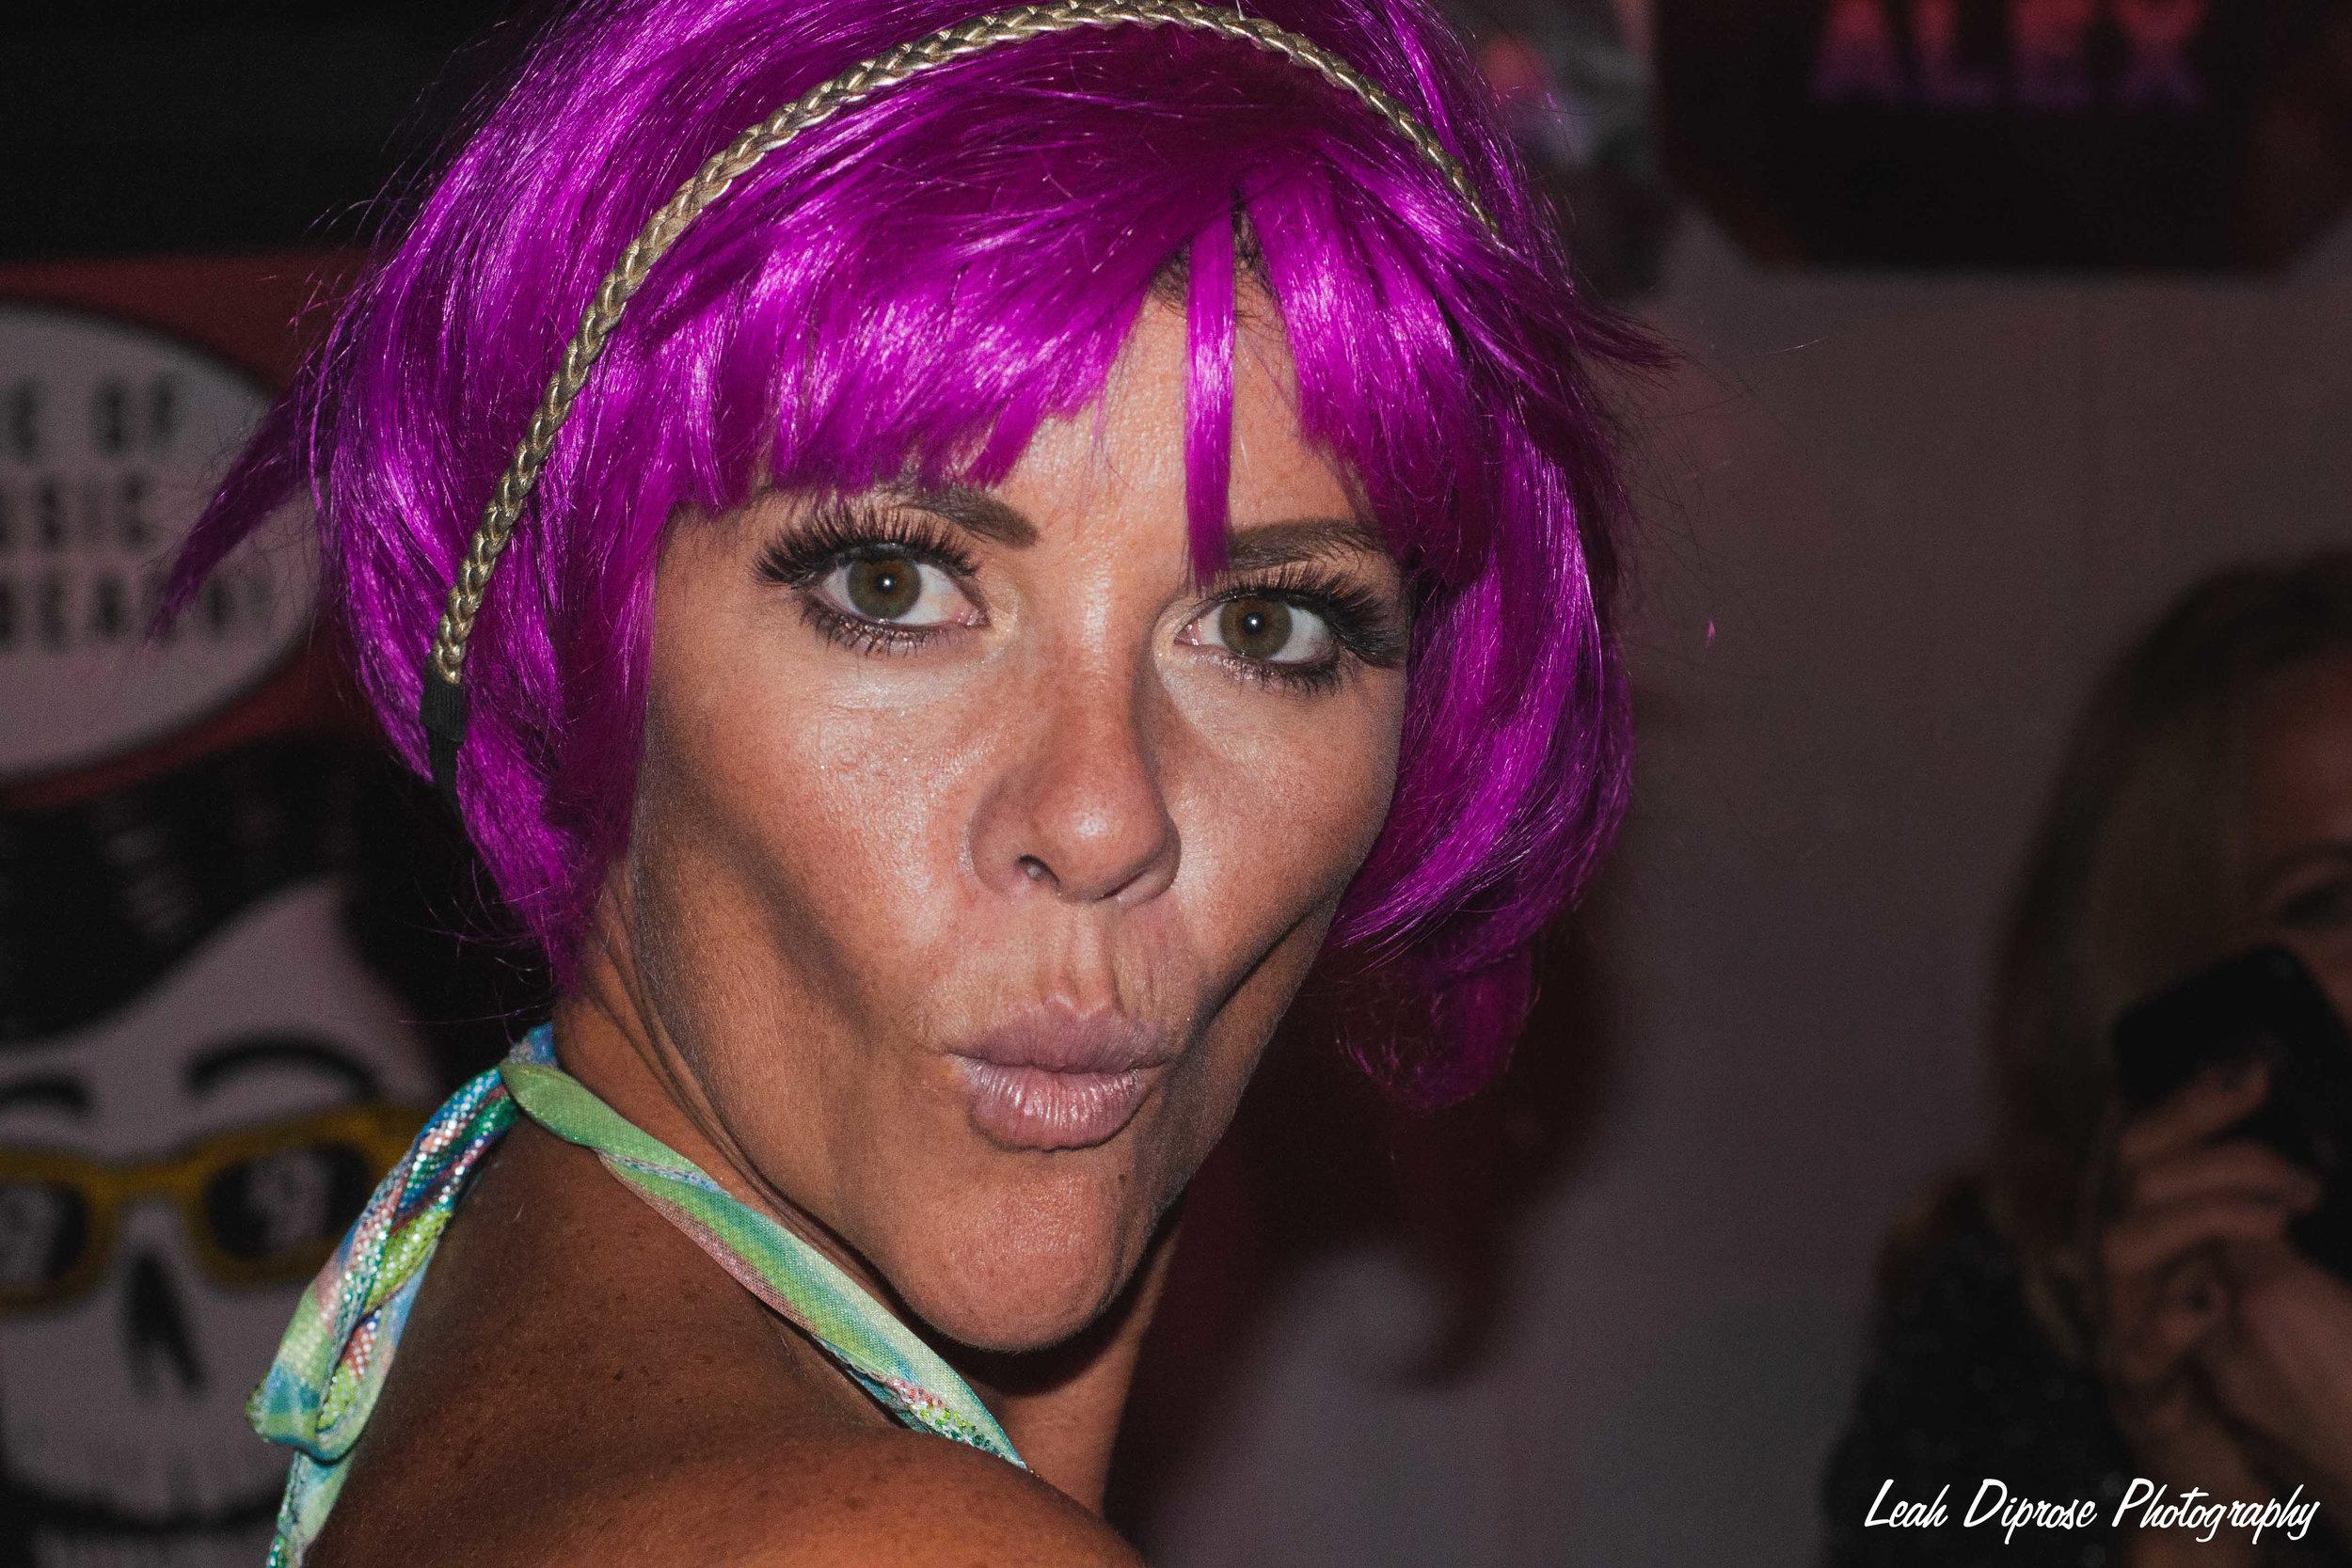 Leah Diprose Photography image-0230.jpg